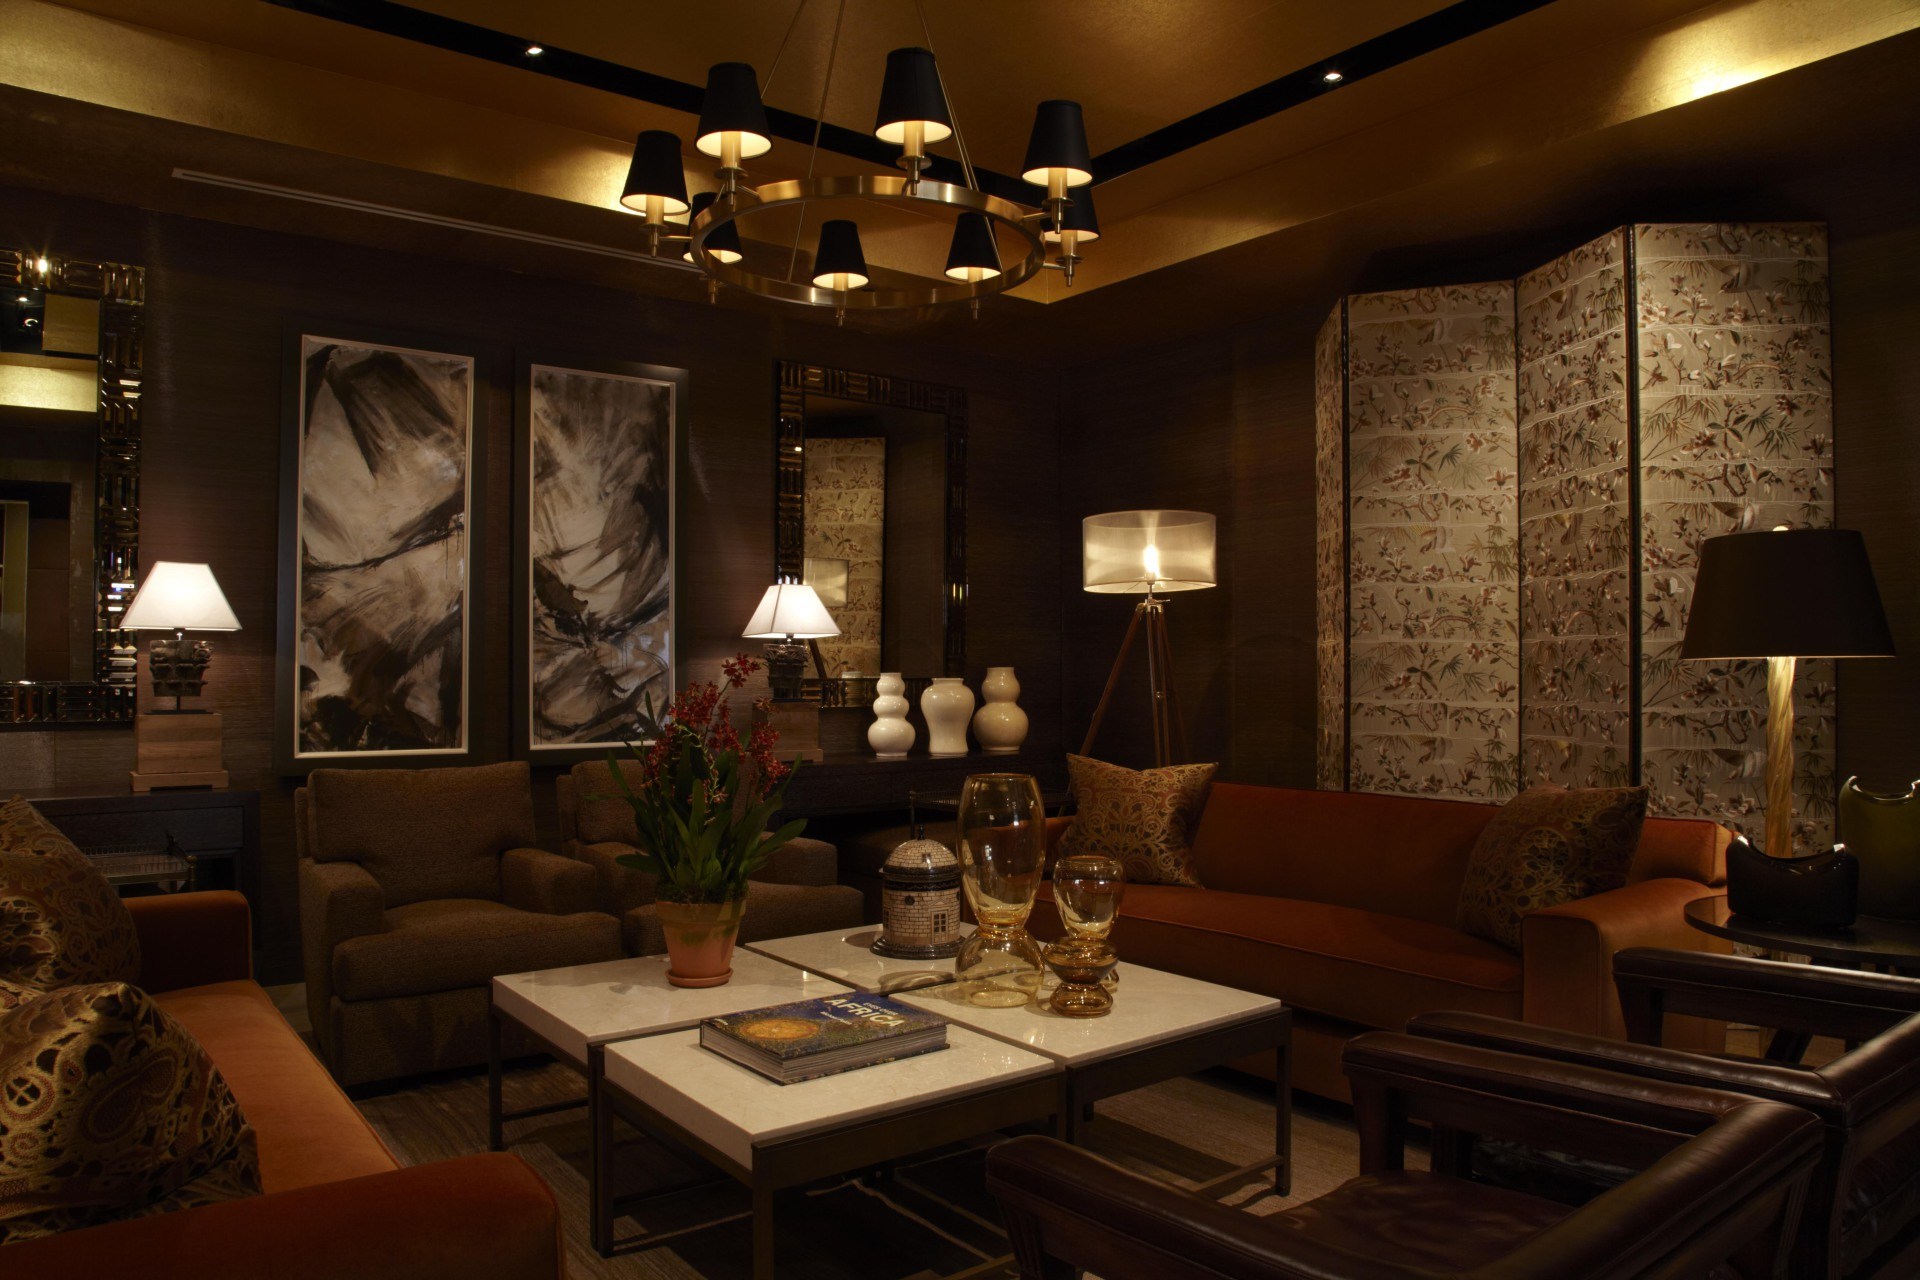 Donghia The Divan Room